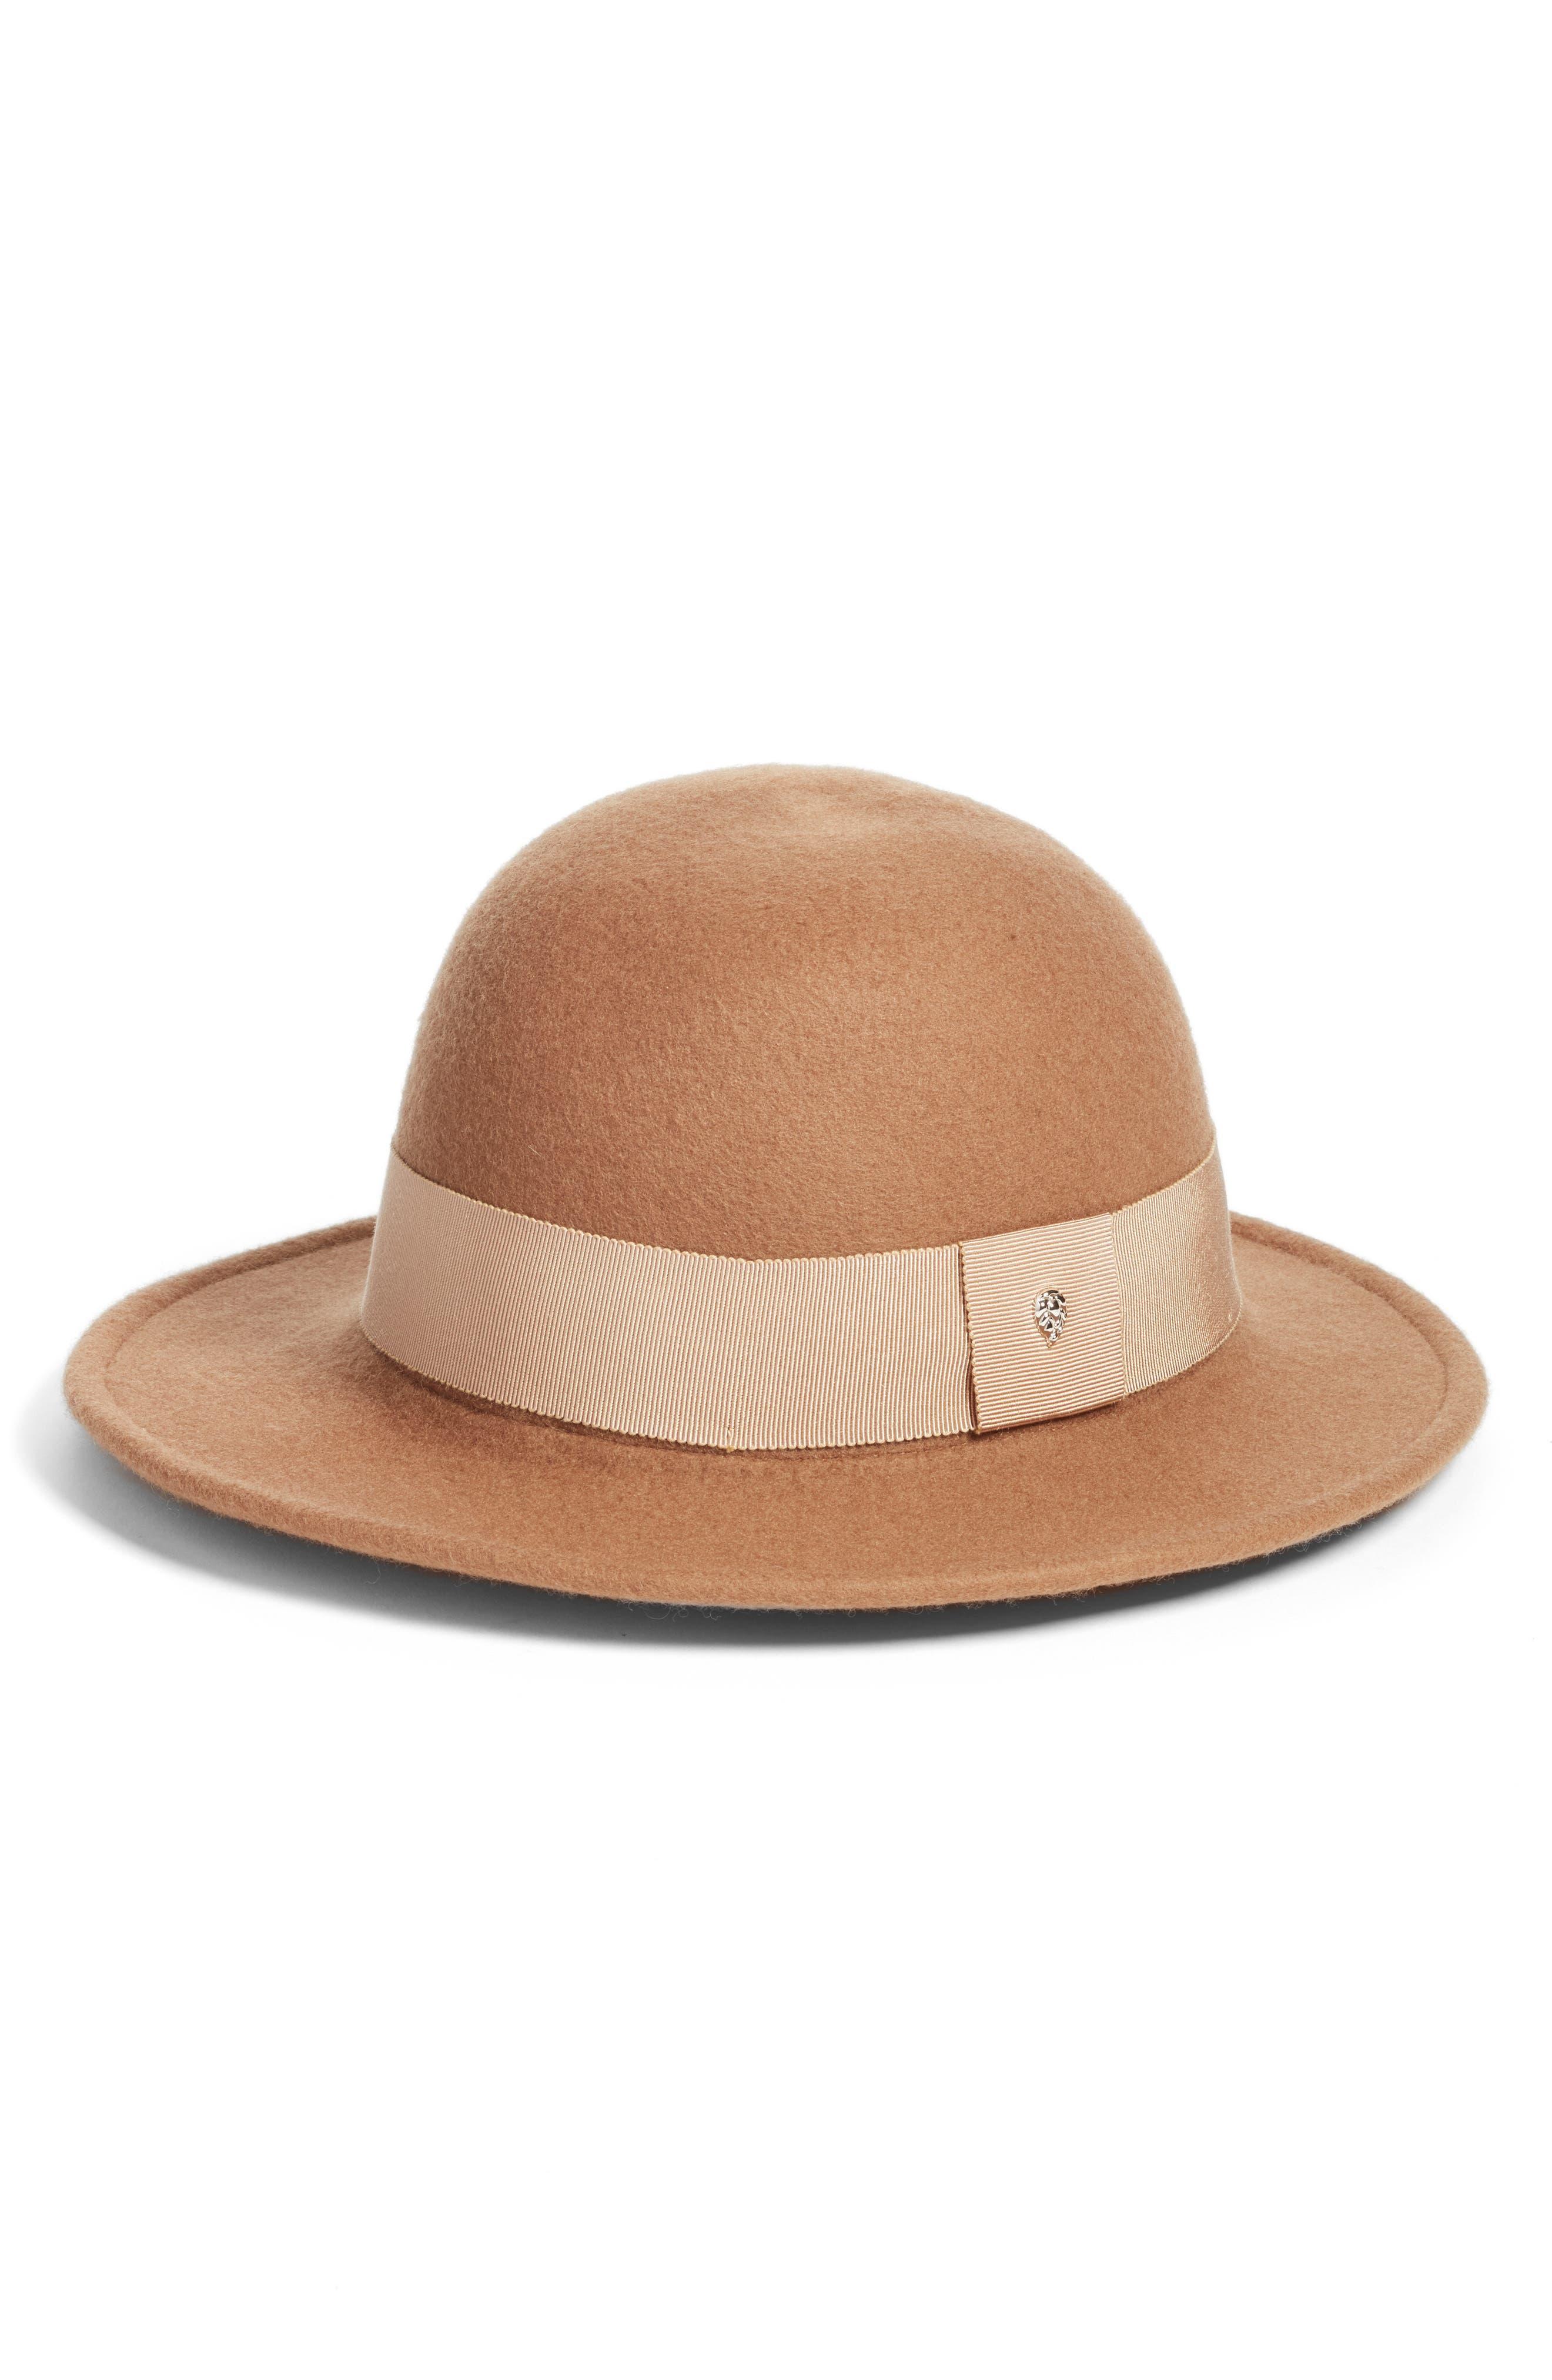 Alternate Image 1 Selected - Helen Kaminski Wool Felt Round Hat